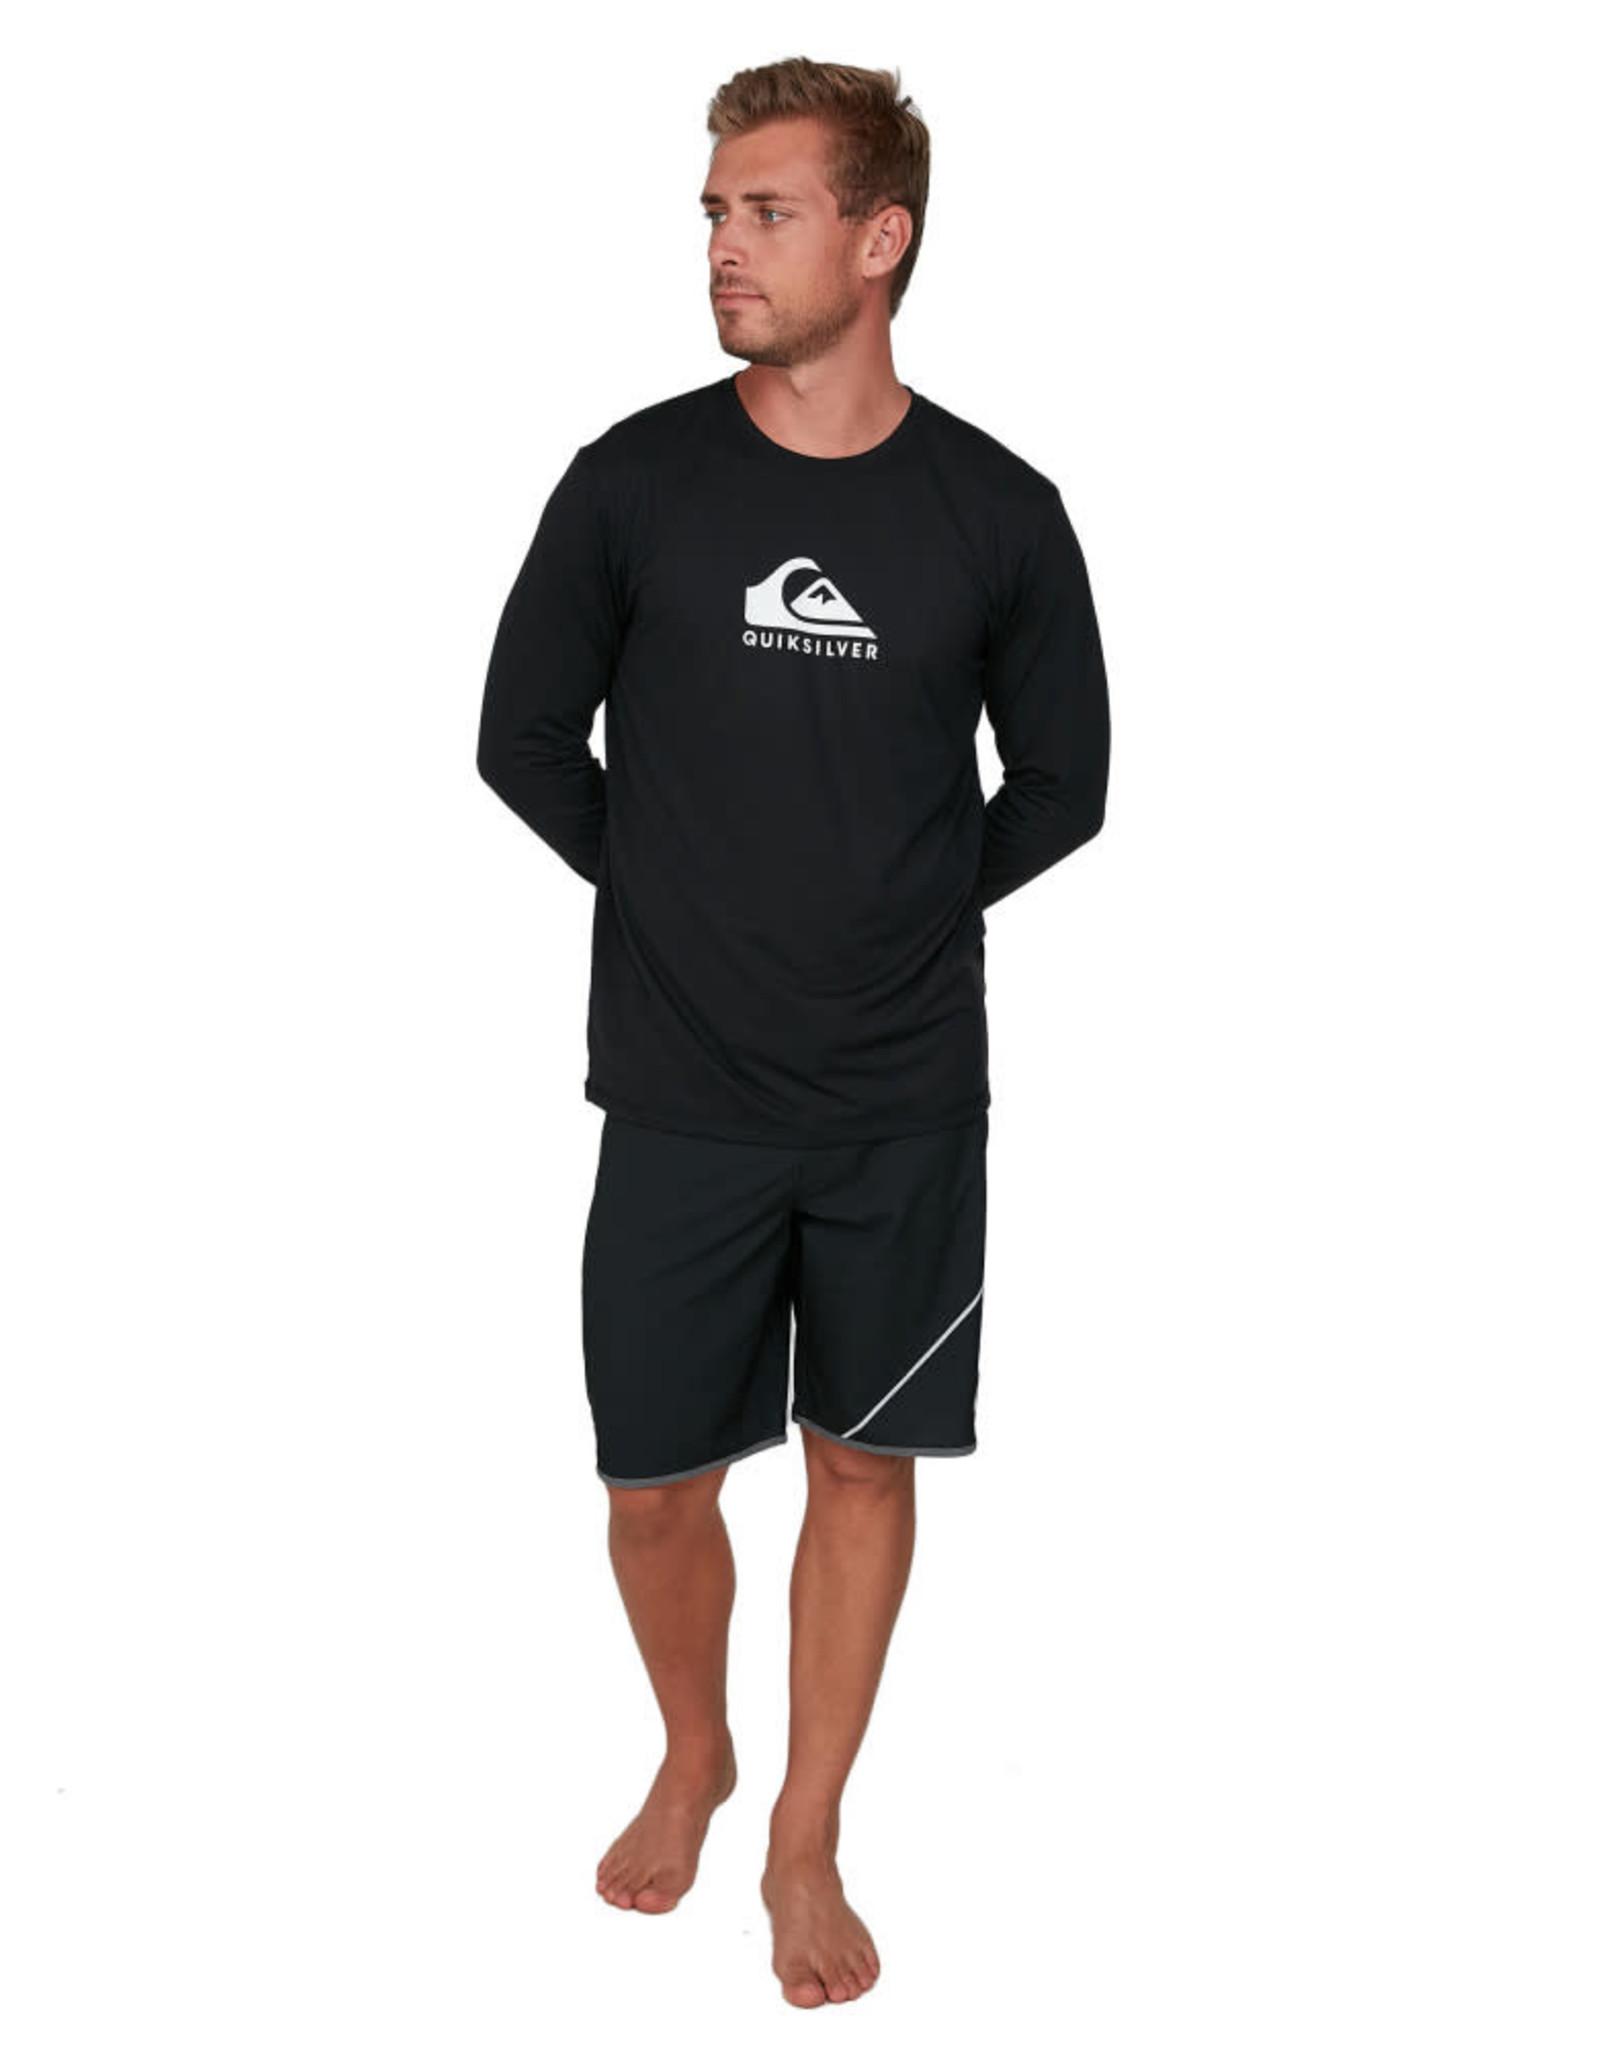 QUIKSILVER Solid Streak Long Sleeve Rash Vest